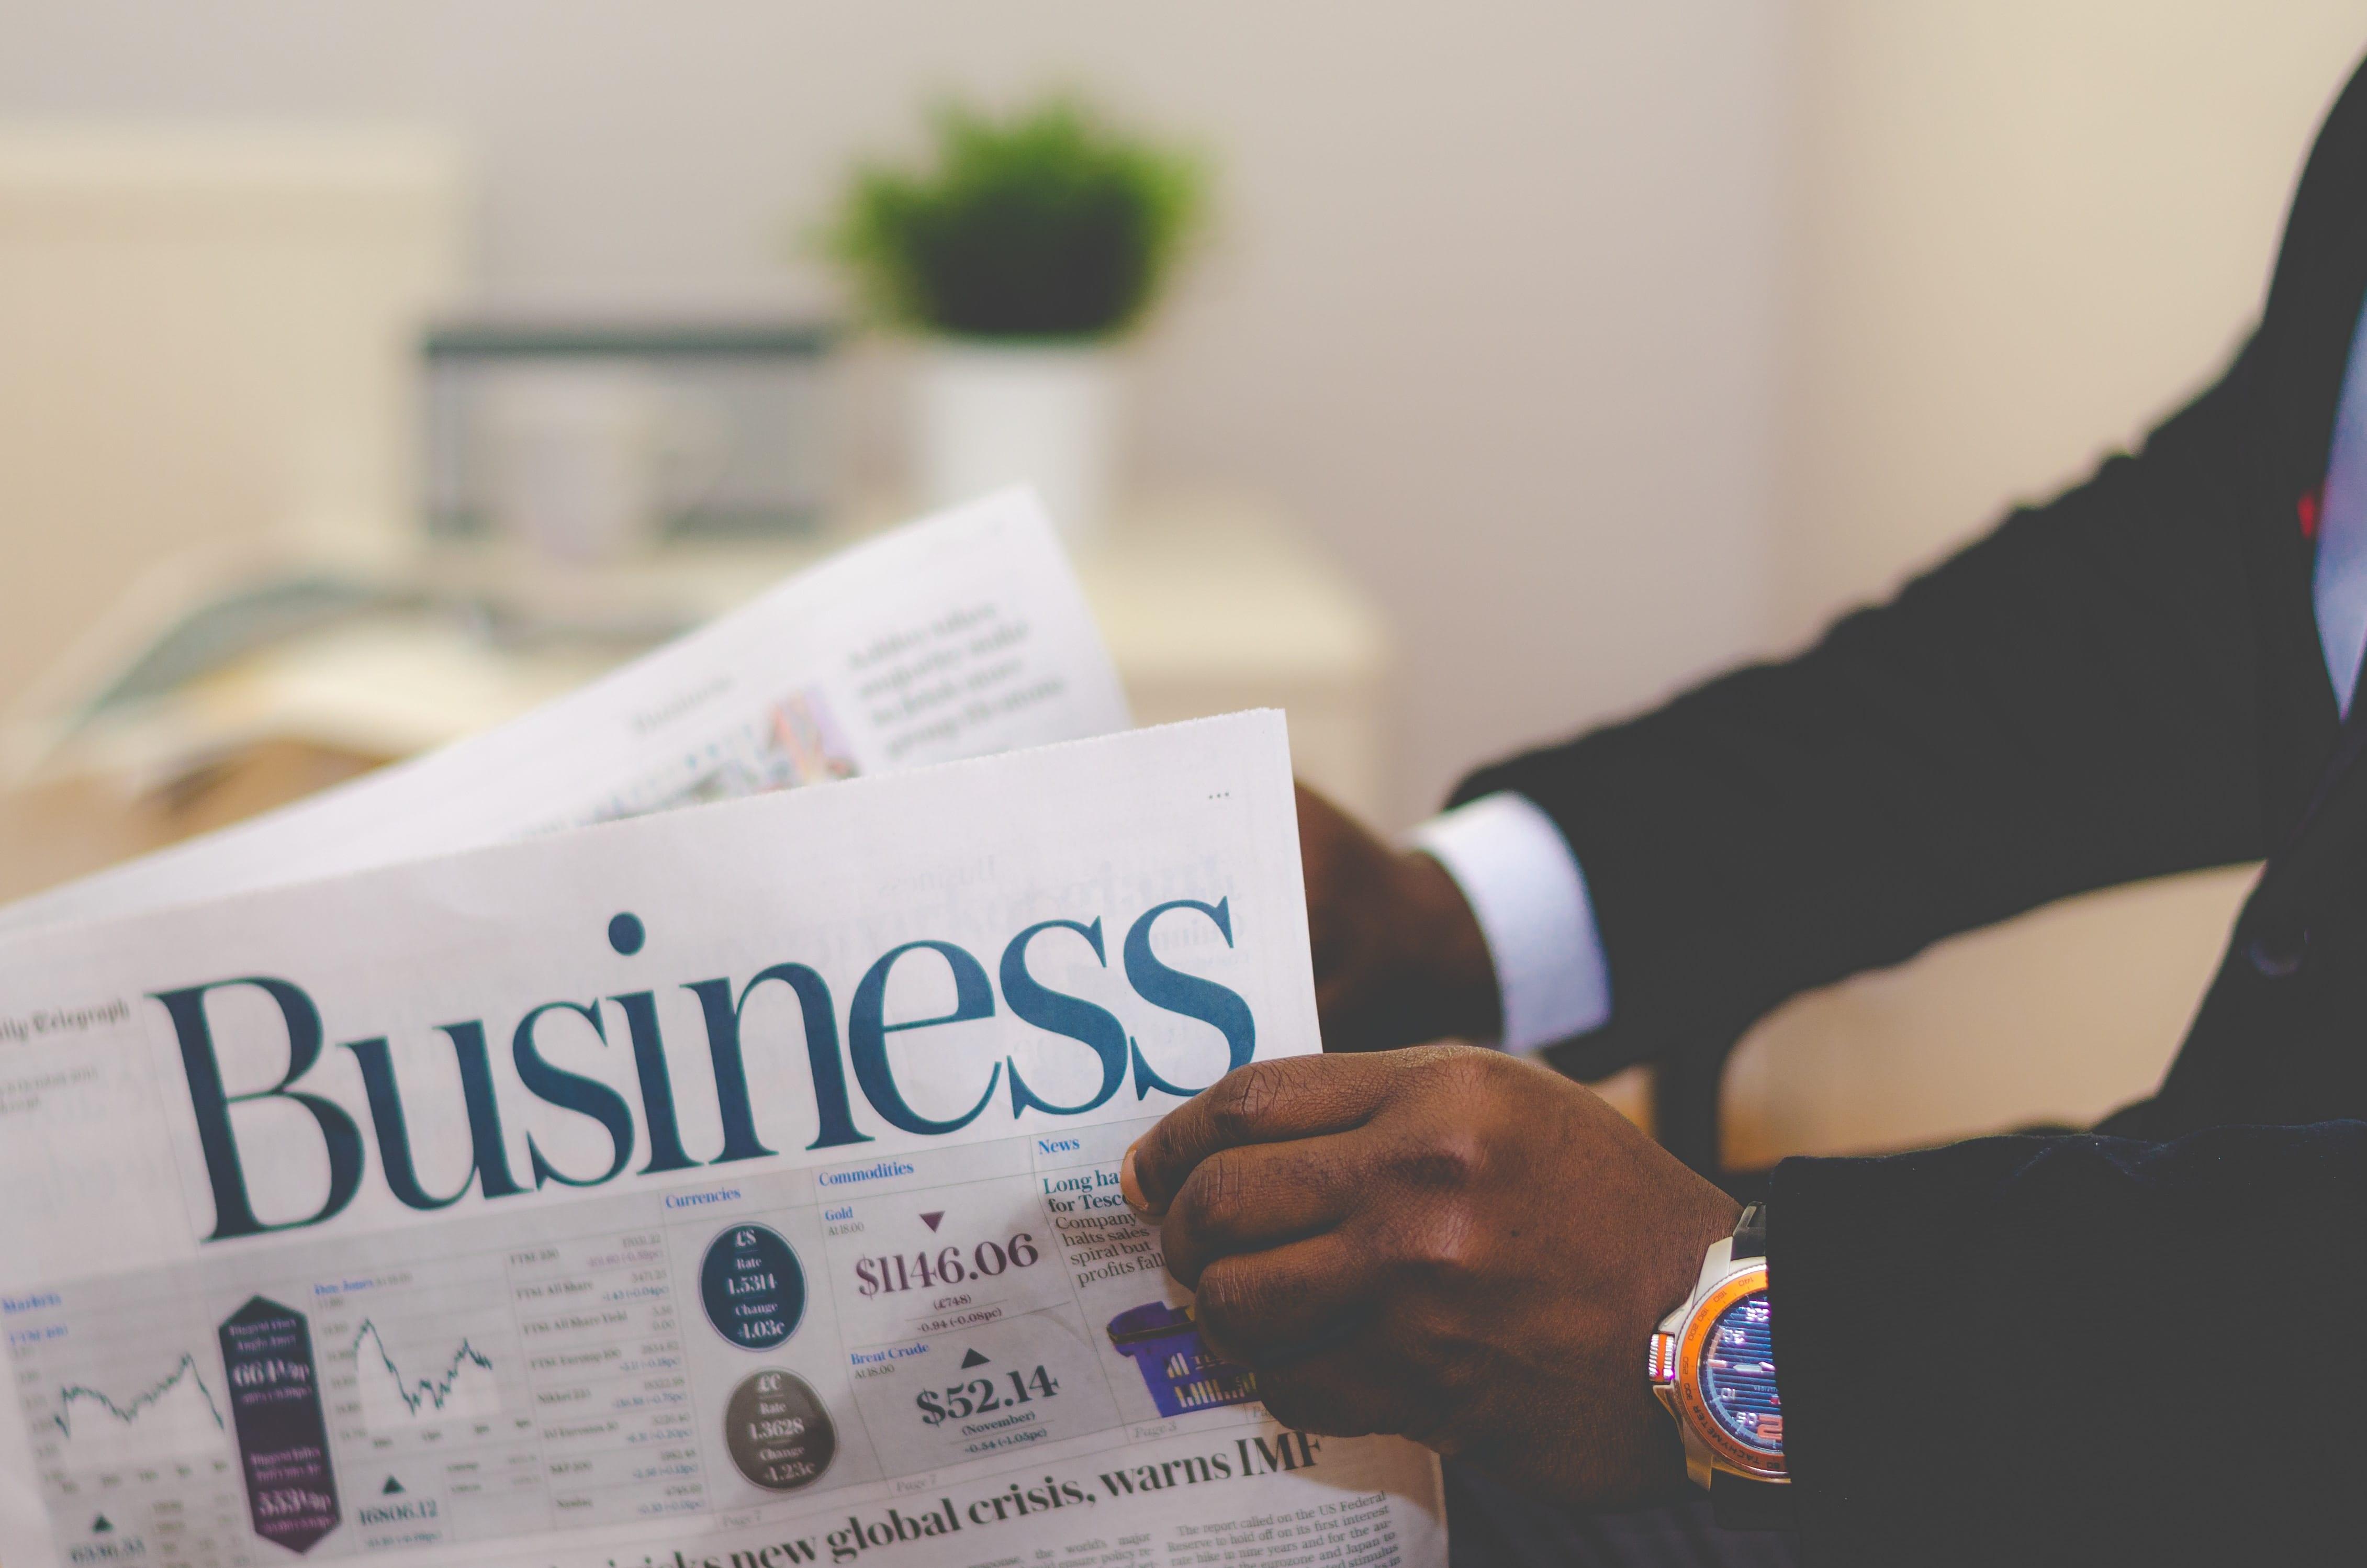 Man in suit reading business newspaper; image by Adeolu Eletu, via Unsplash.com.